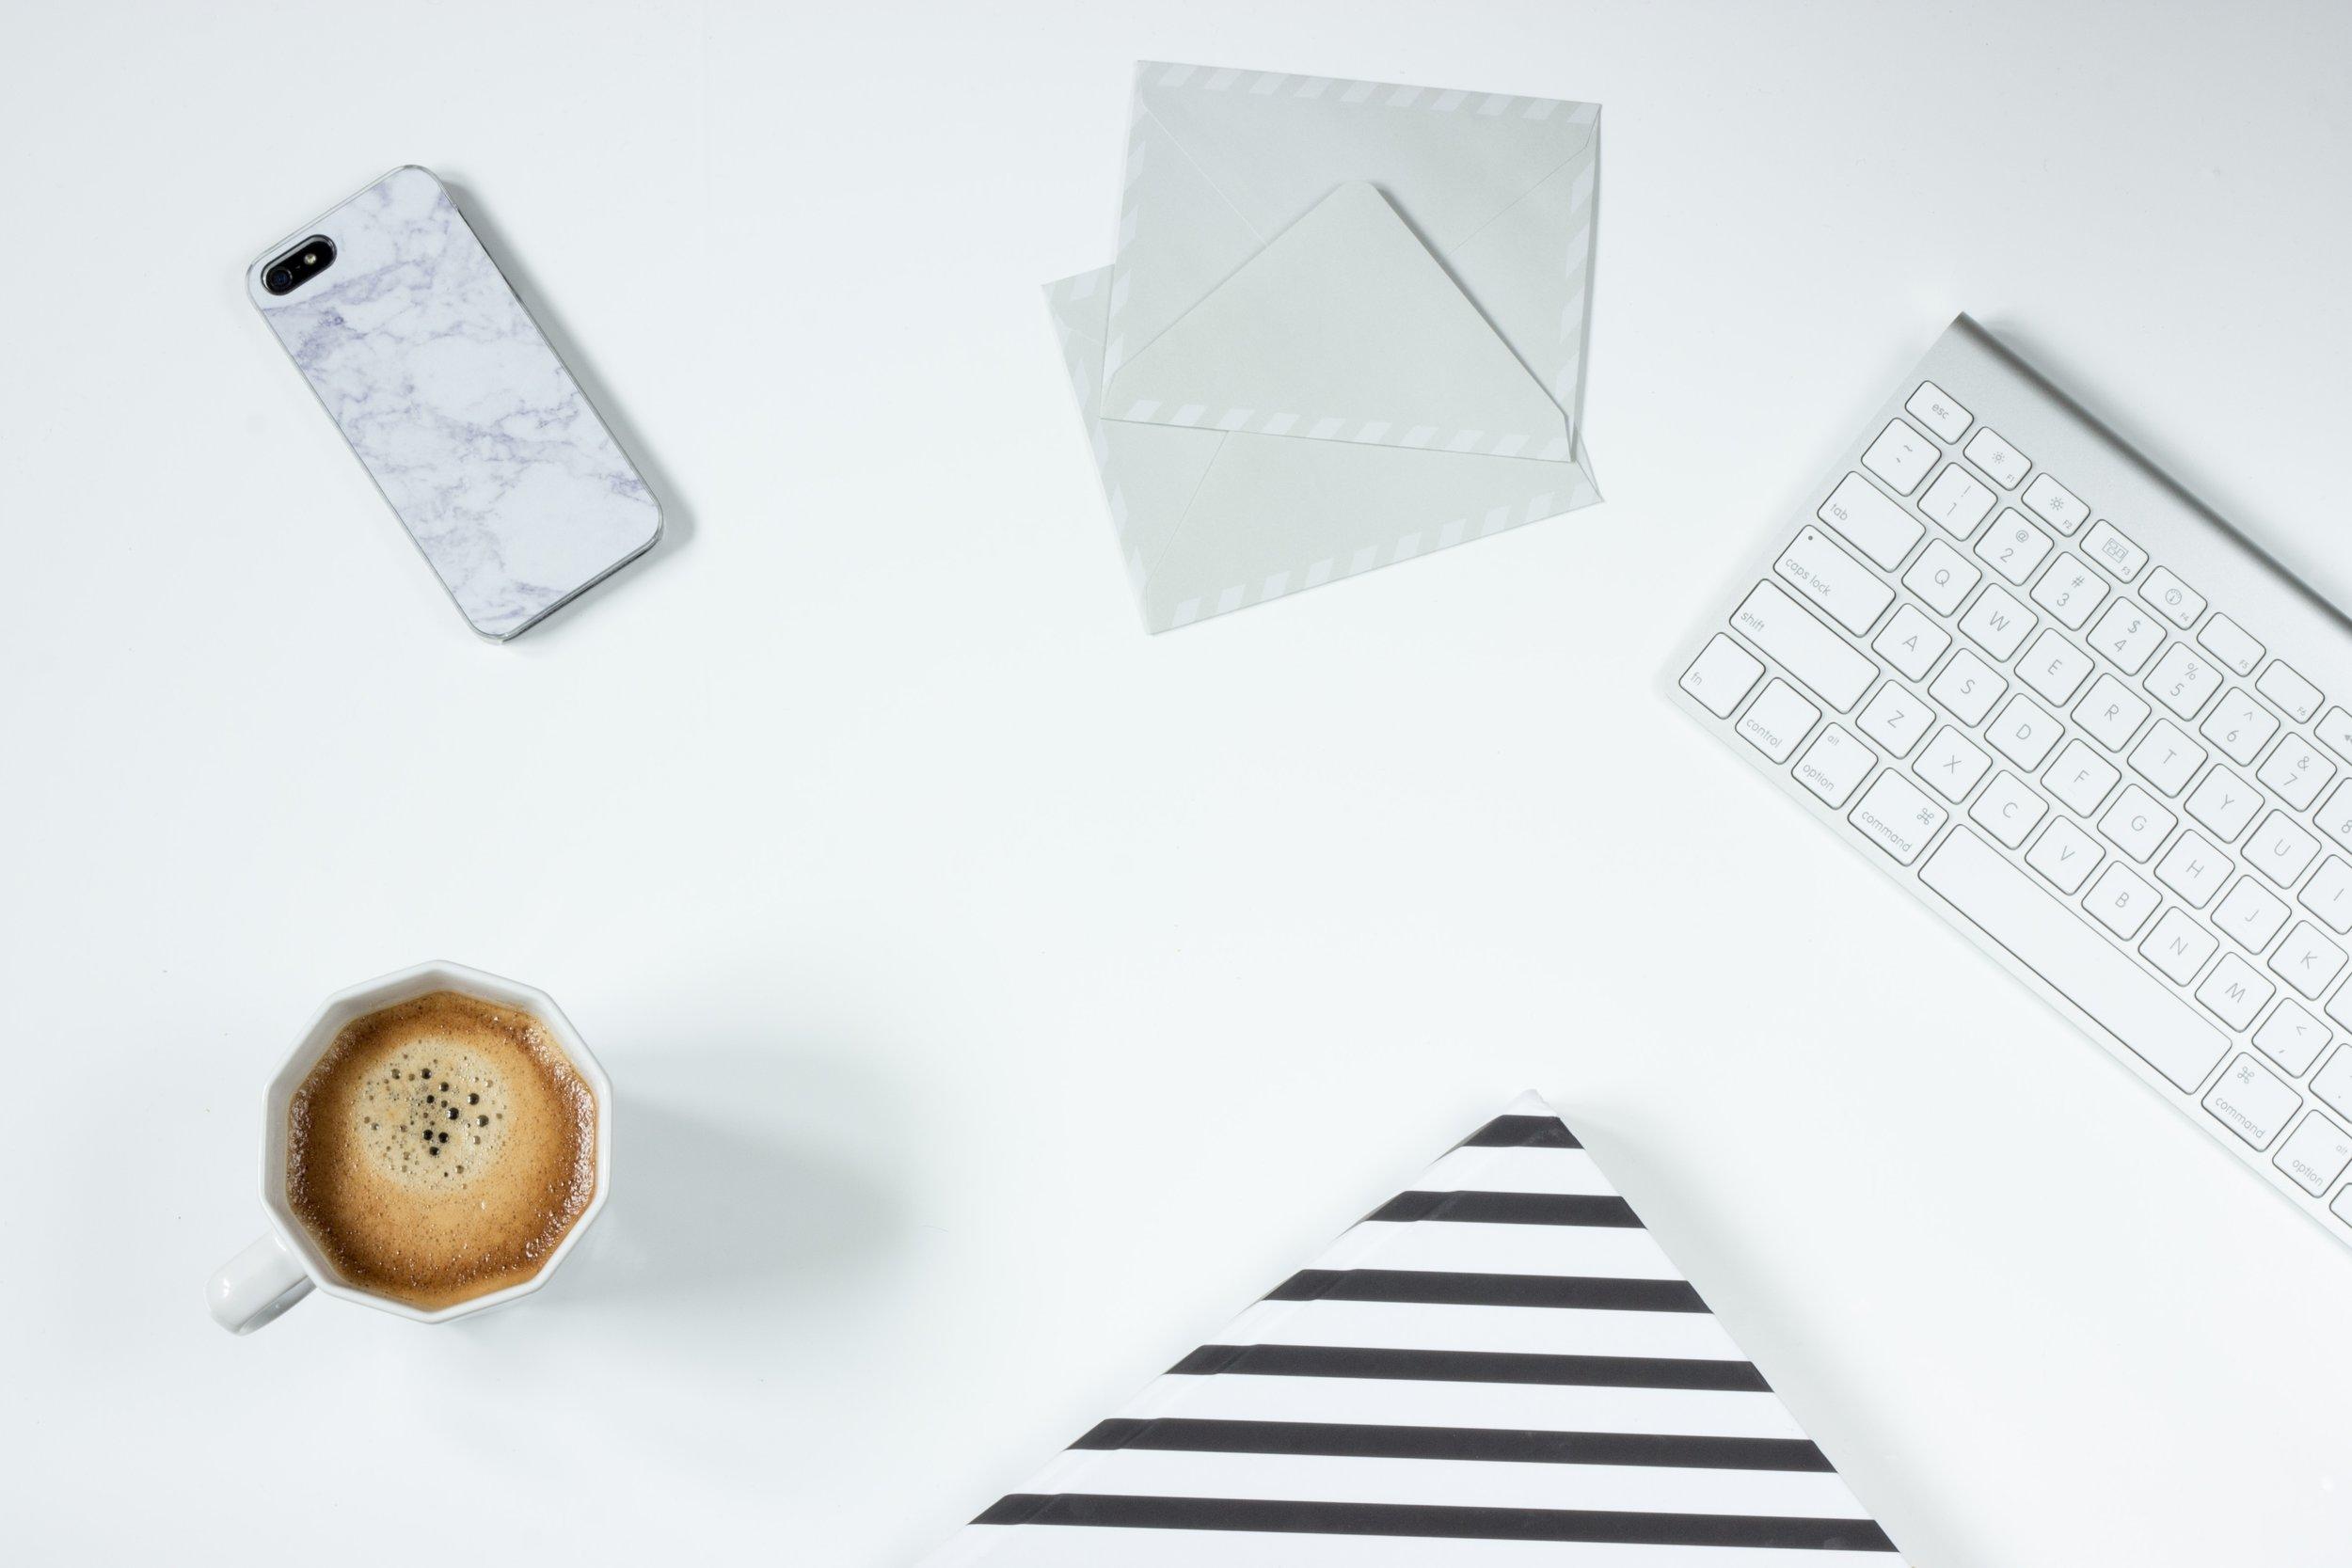 coffee-work-desk-mug-keyboard-162616.jpeg